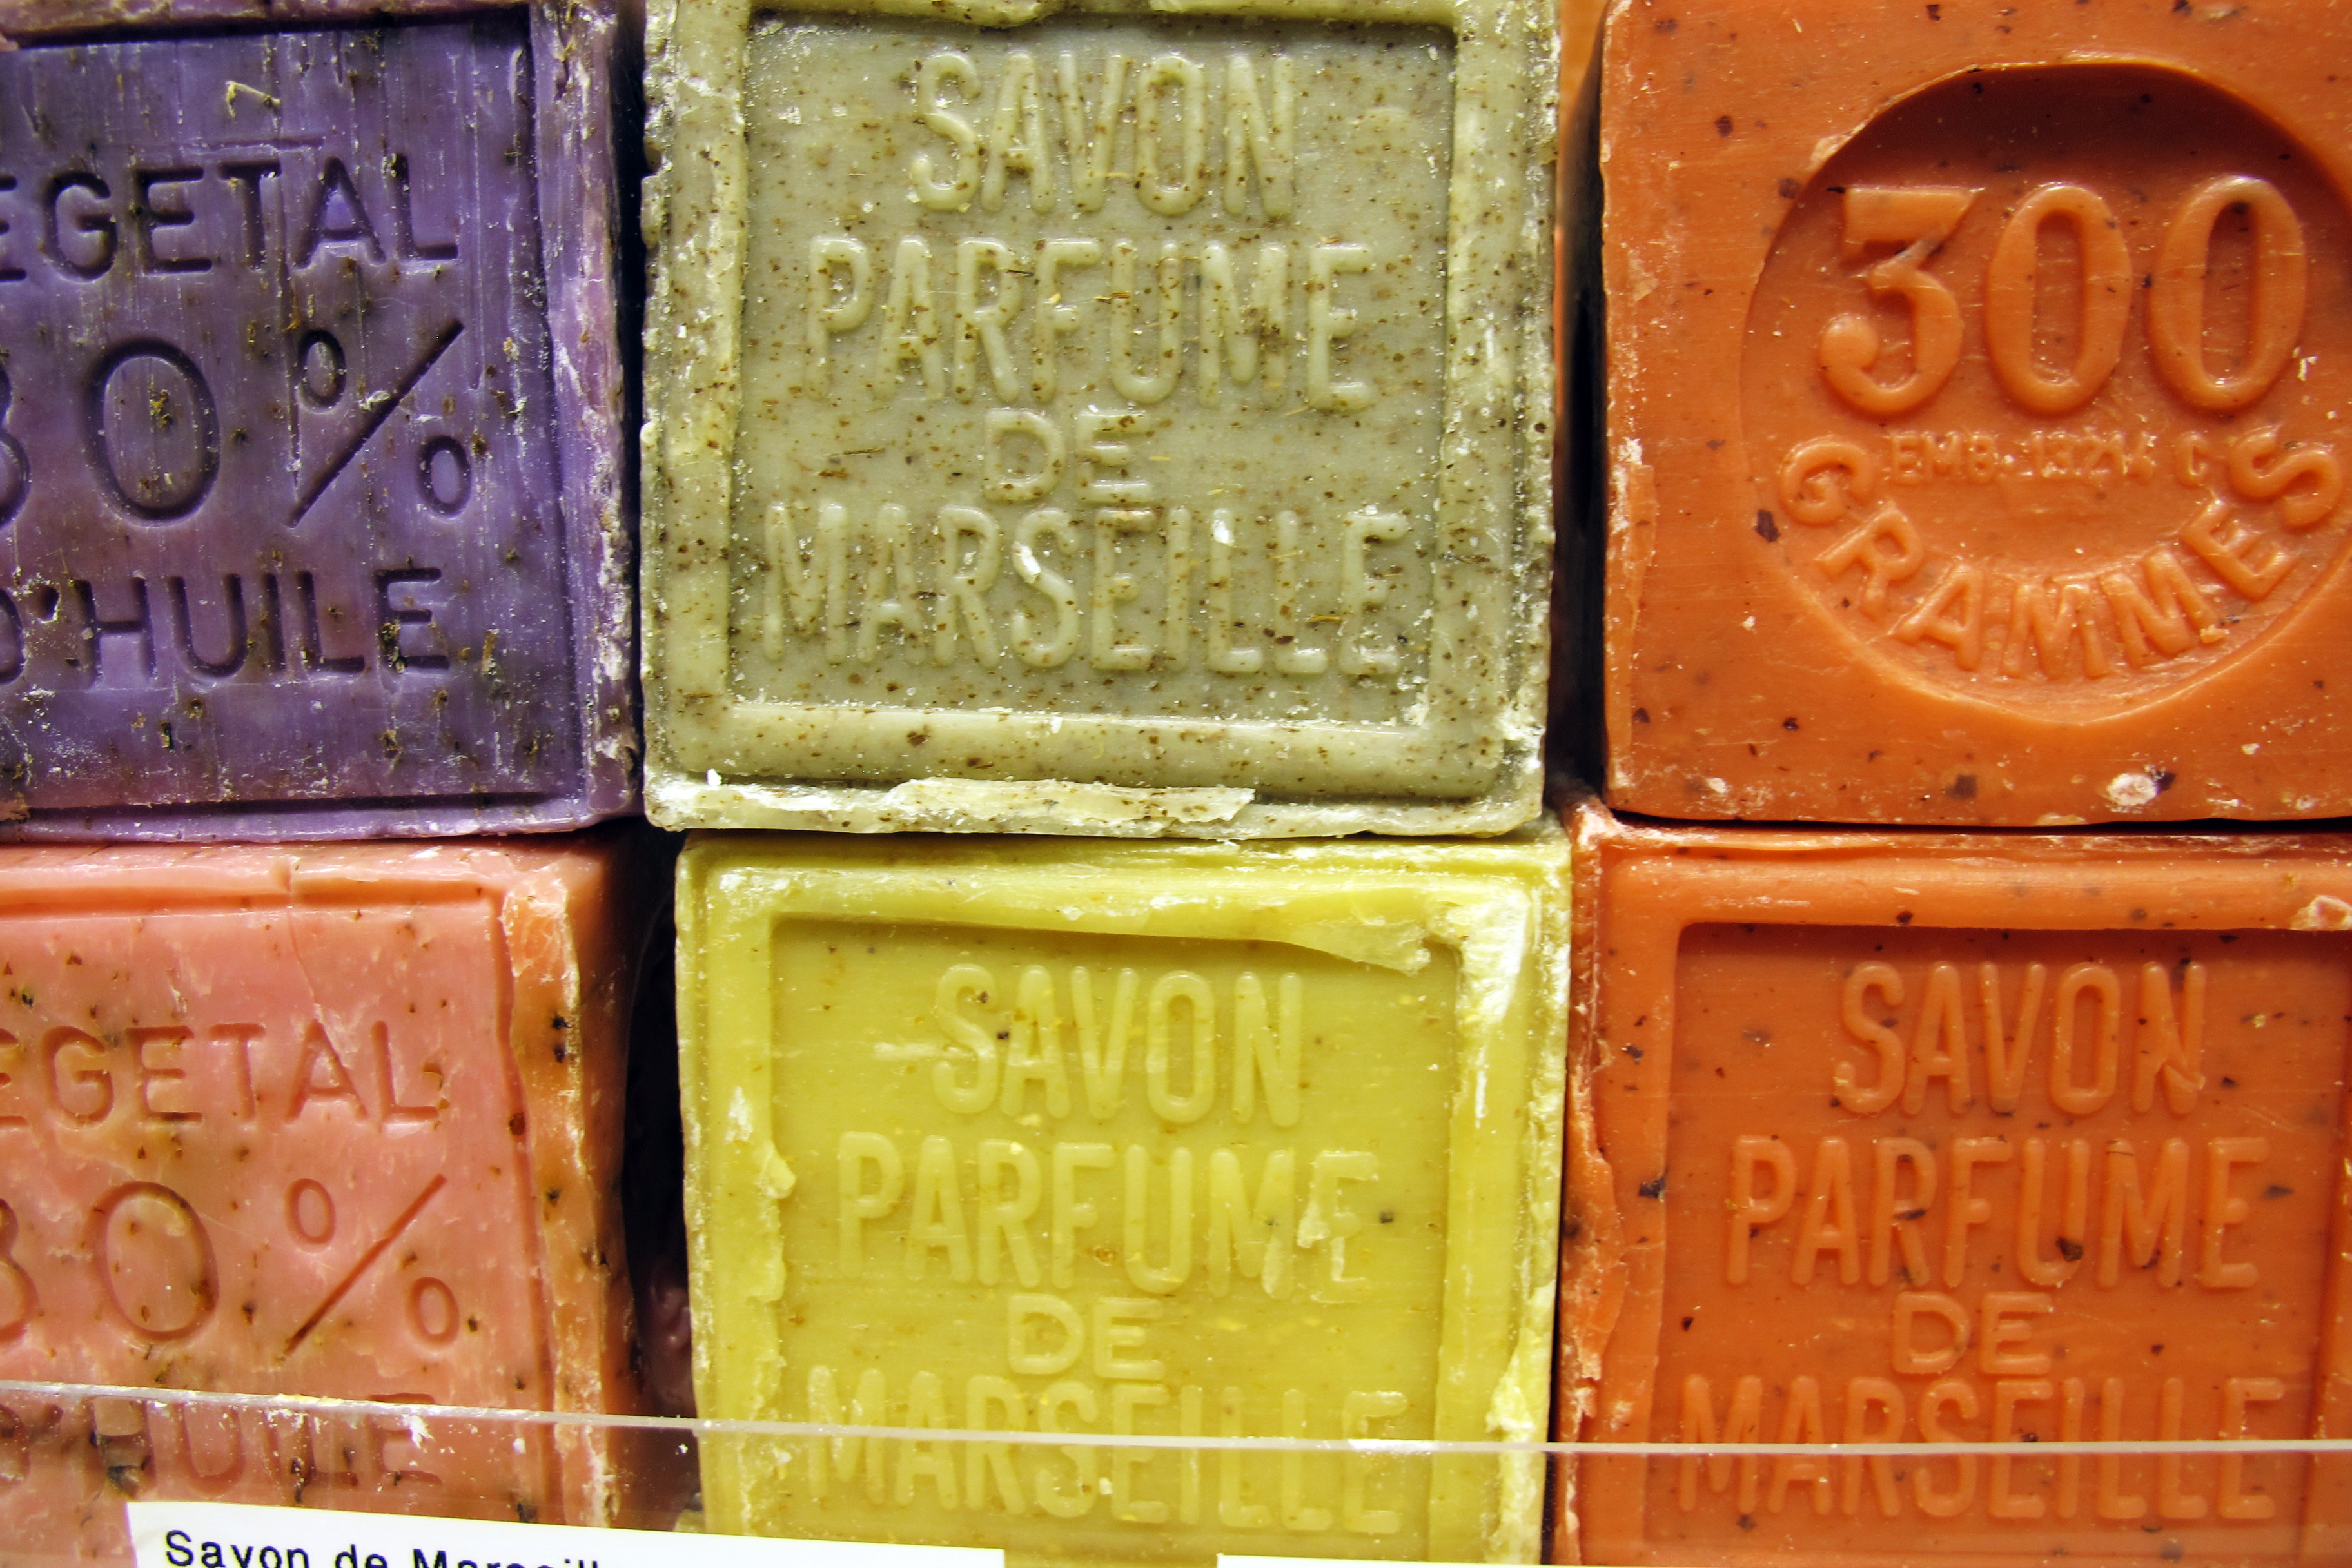 Savons de Marseille parfumés